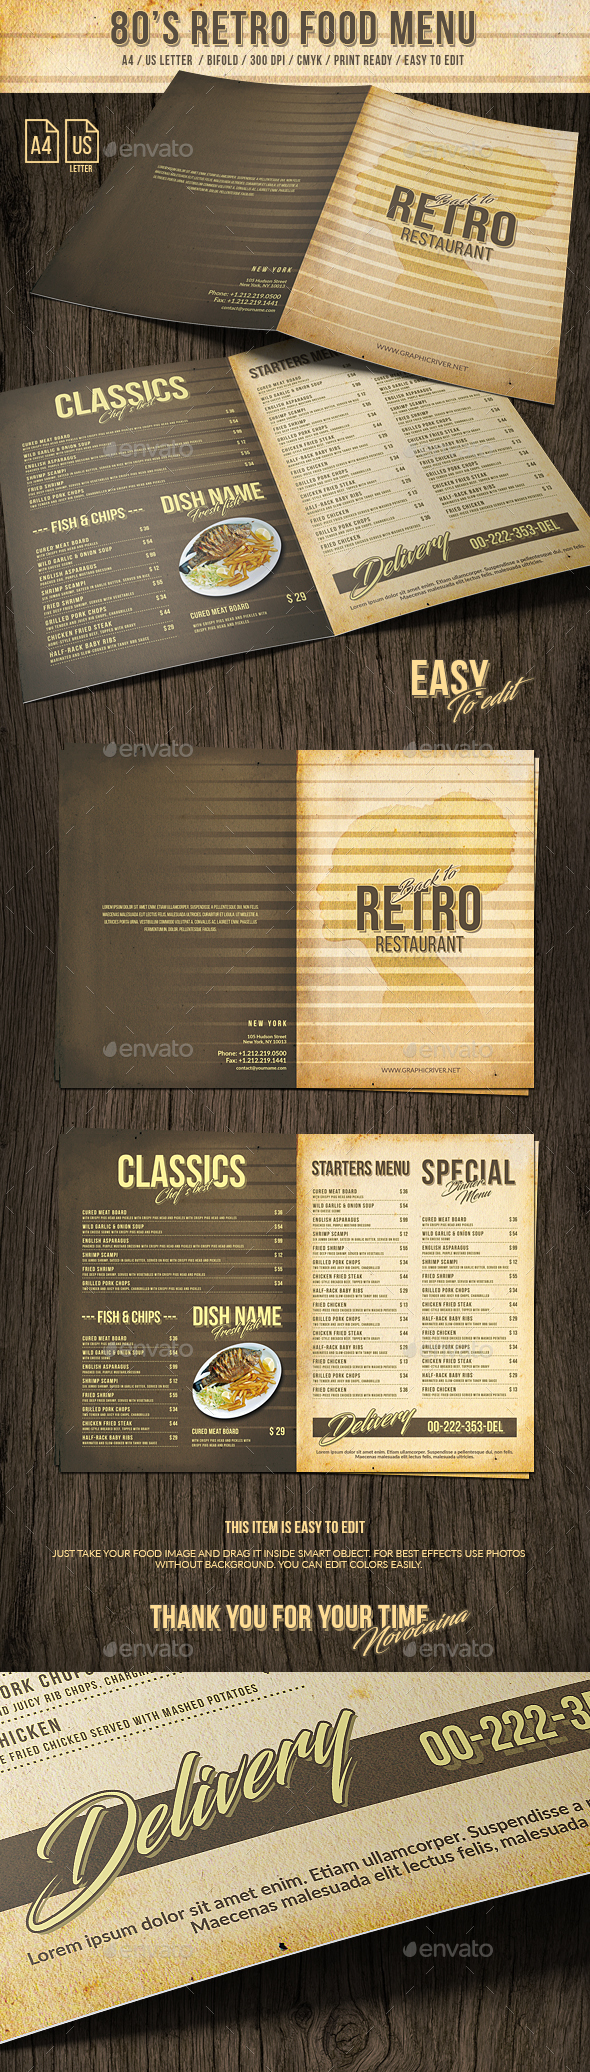 80s Retro Bifold Food Menu US Letter and A4 - Food Menus Print Templates